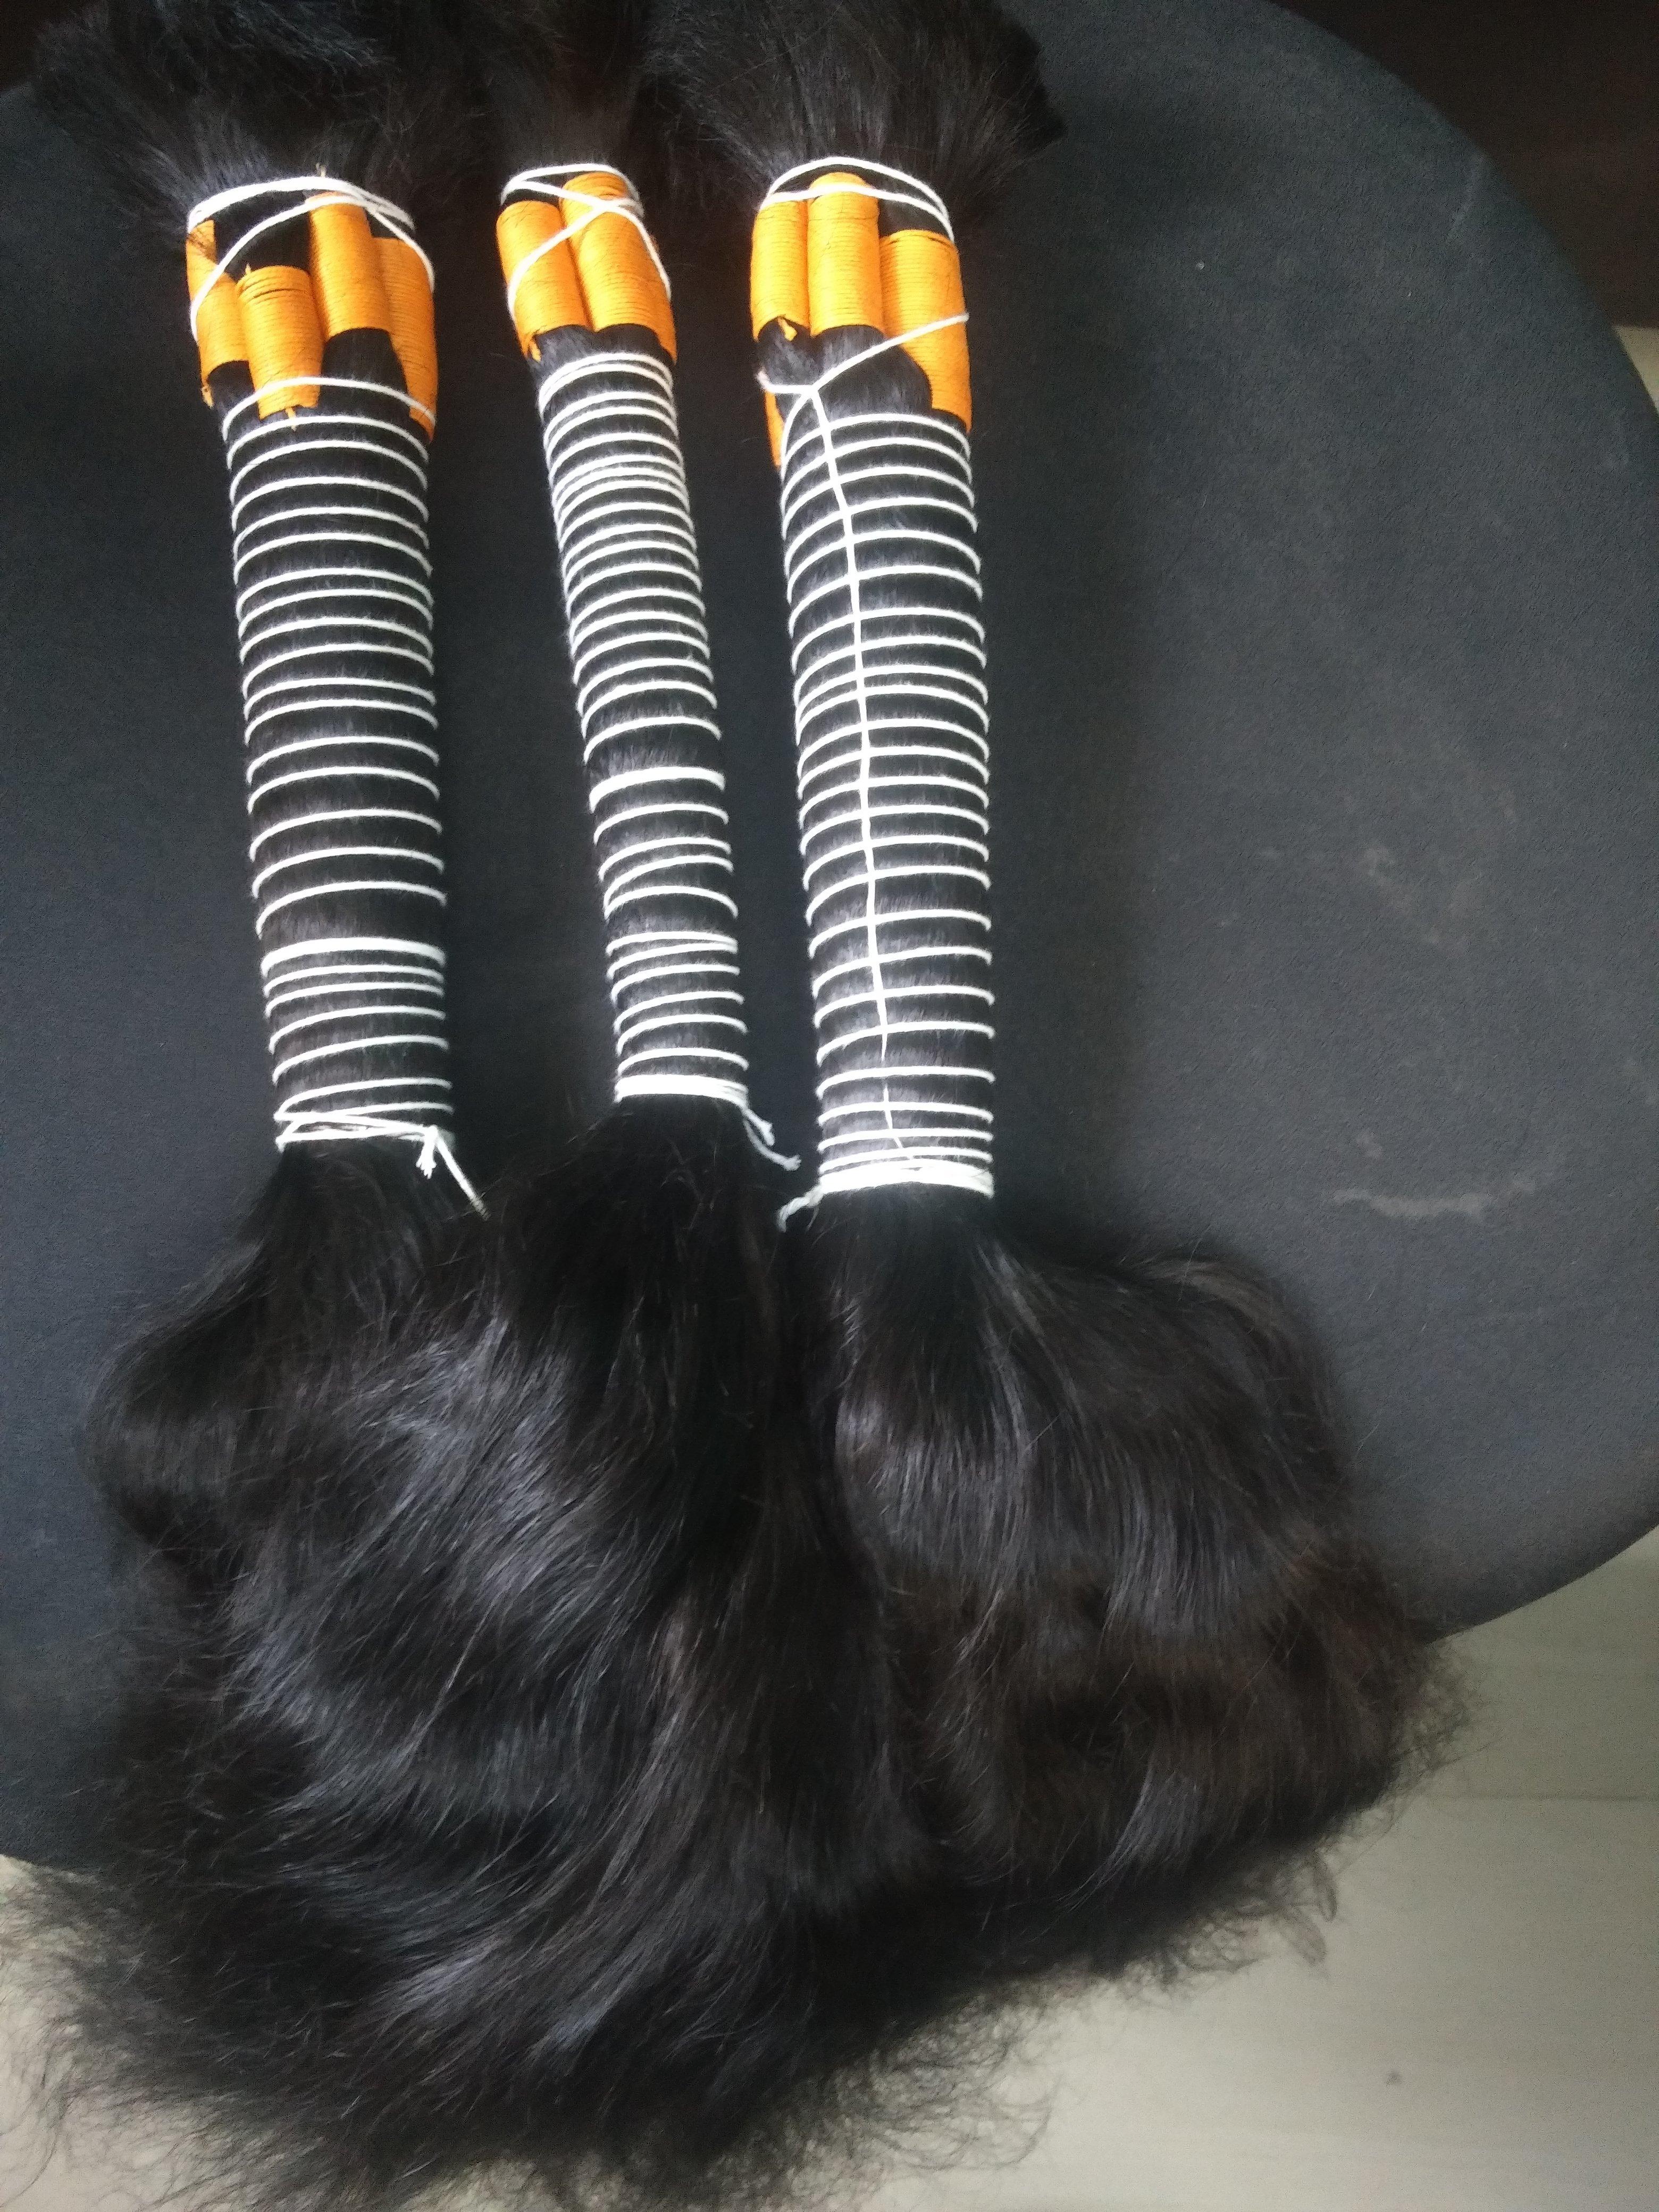 SHORT HAIR EXTENSIONS